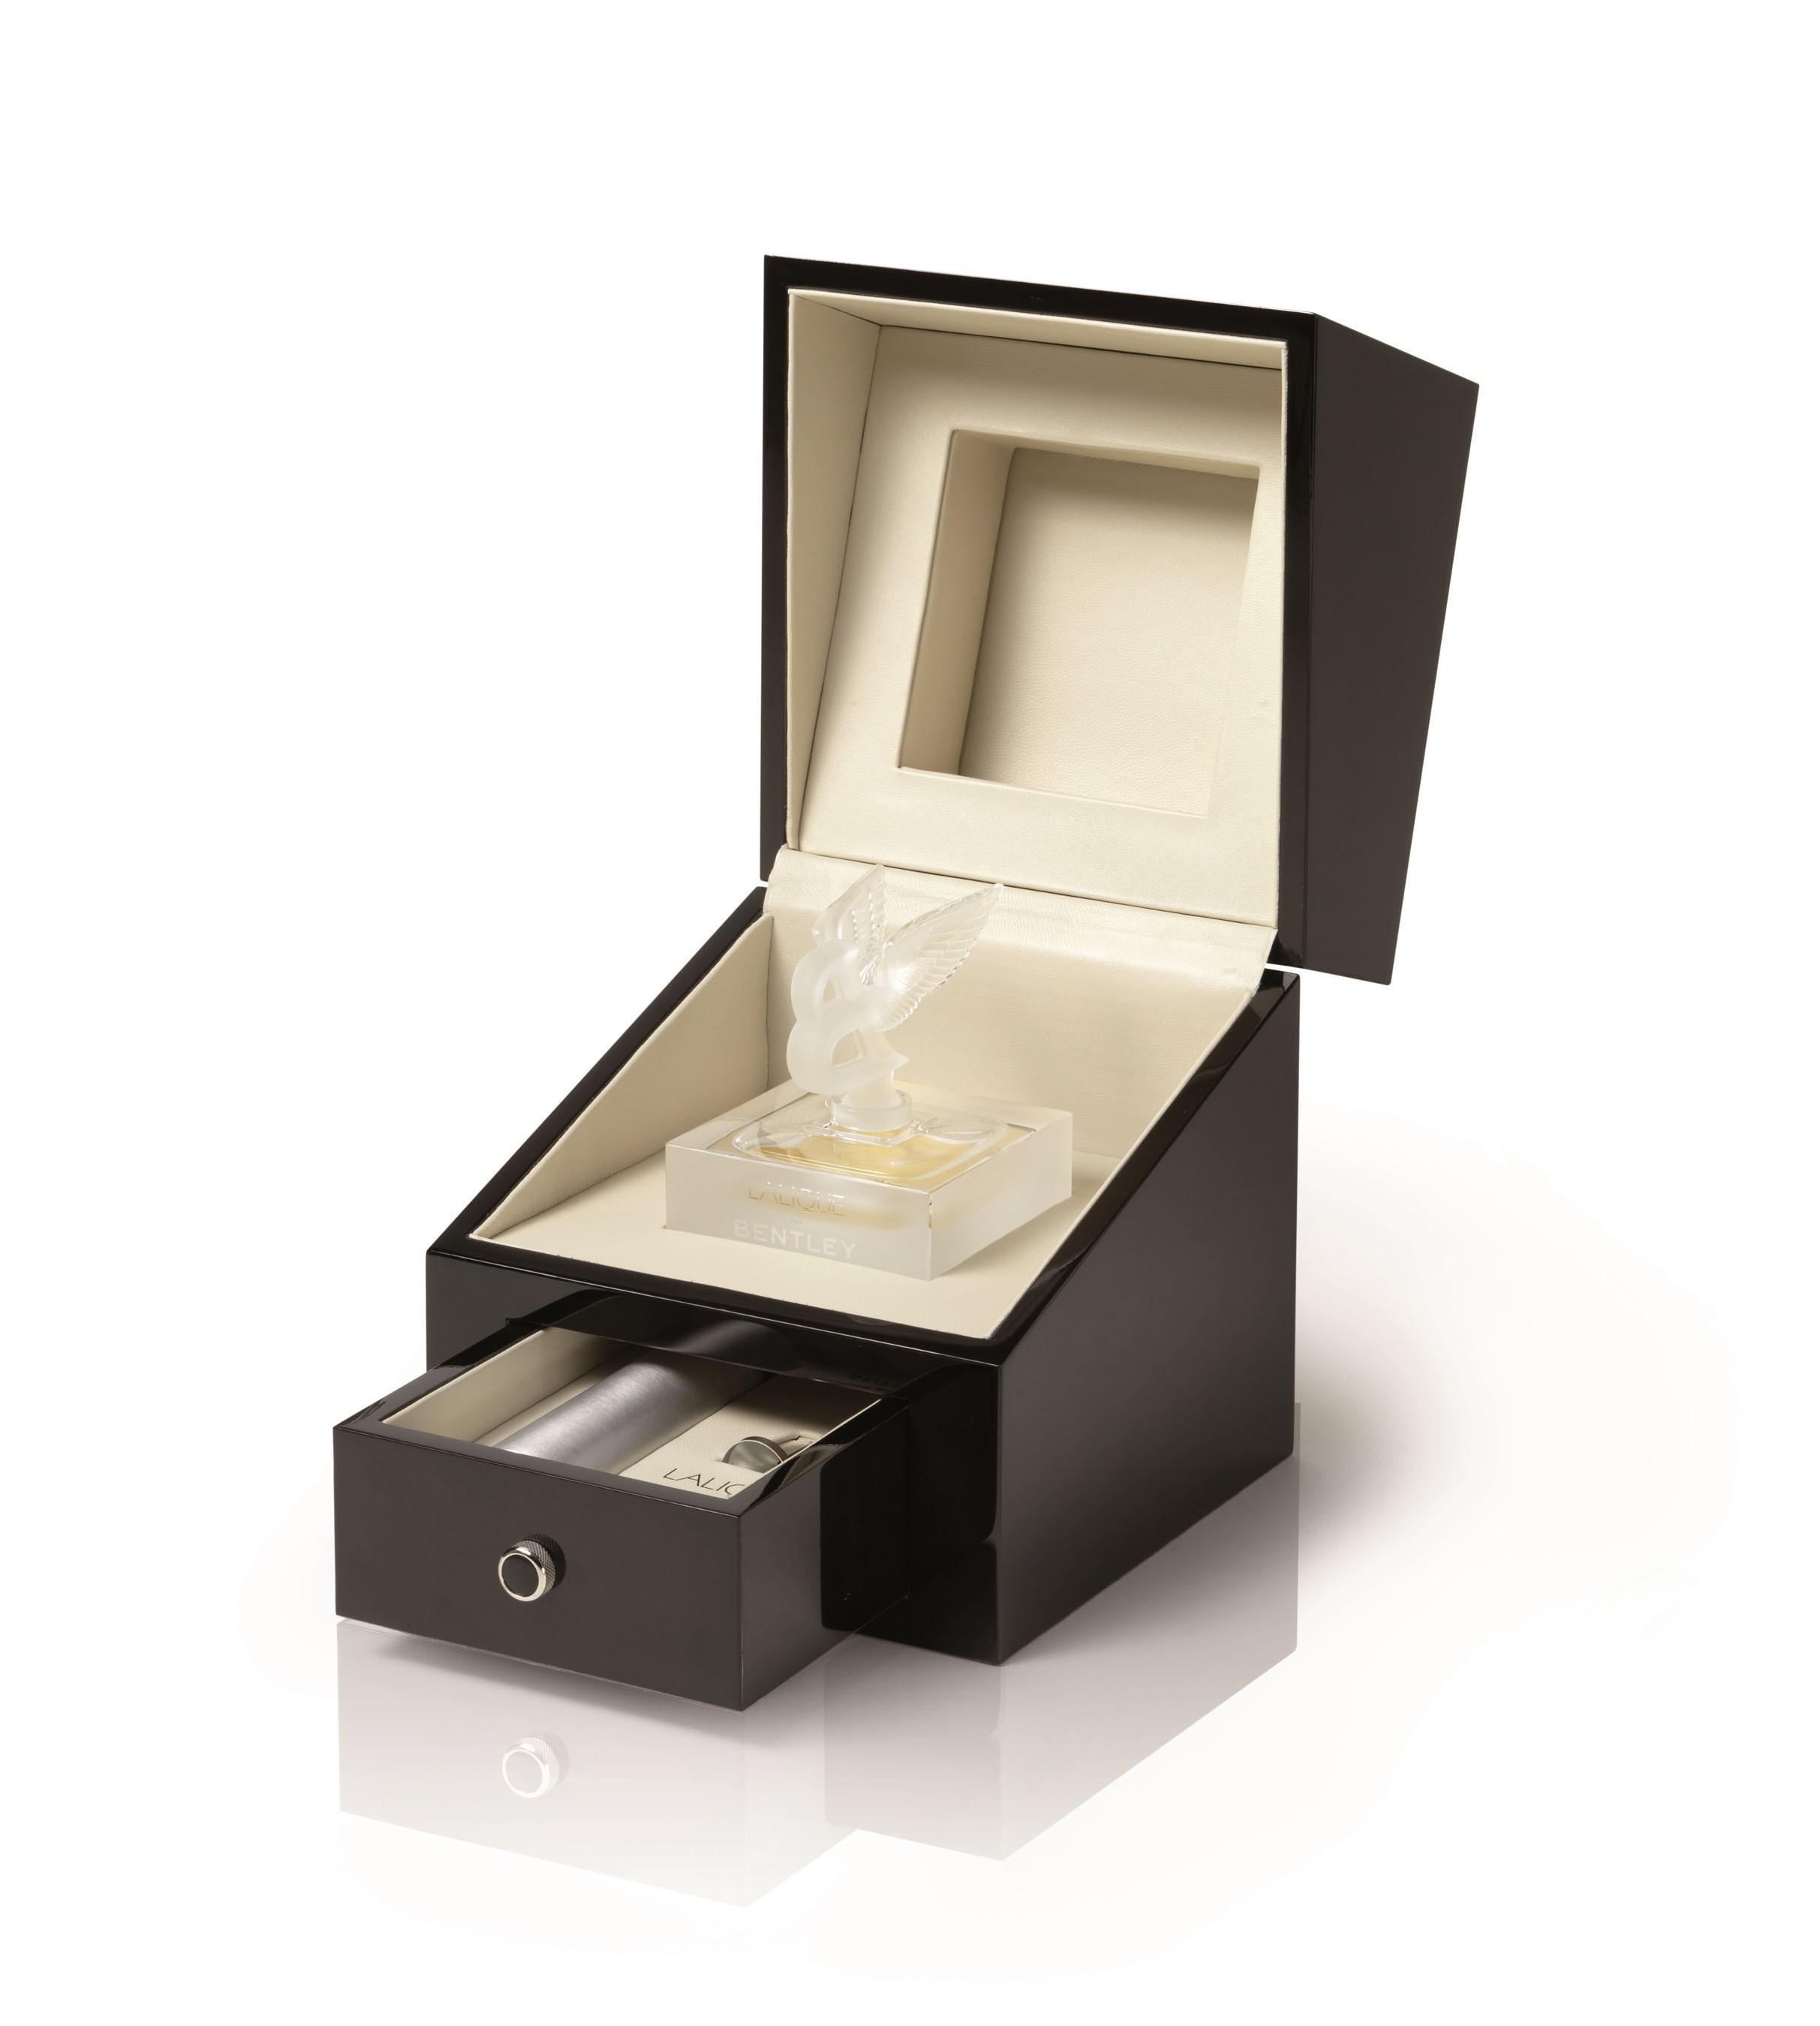 Lalique for Bentley аромат для мужчин